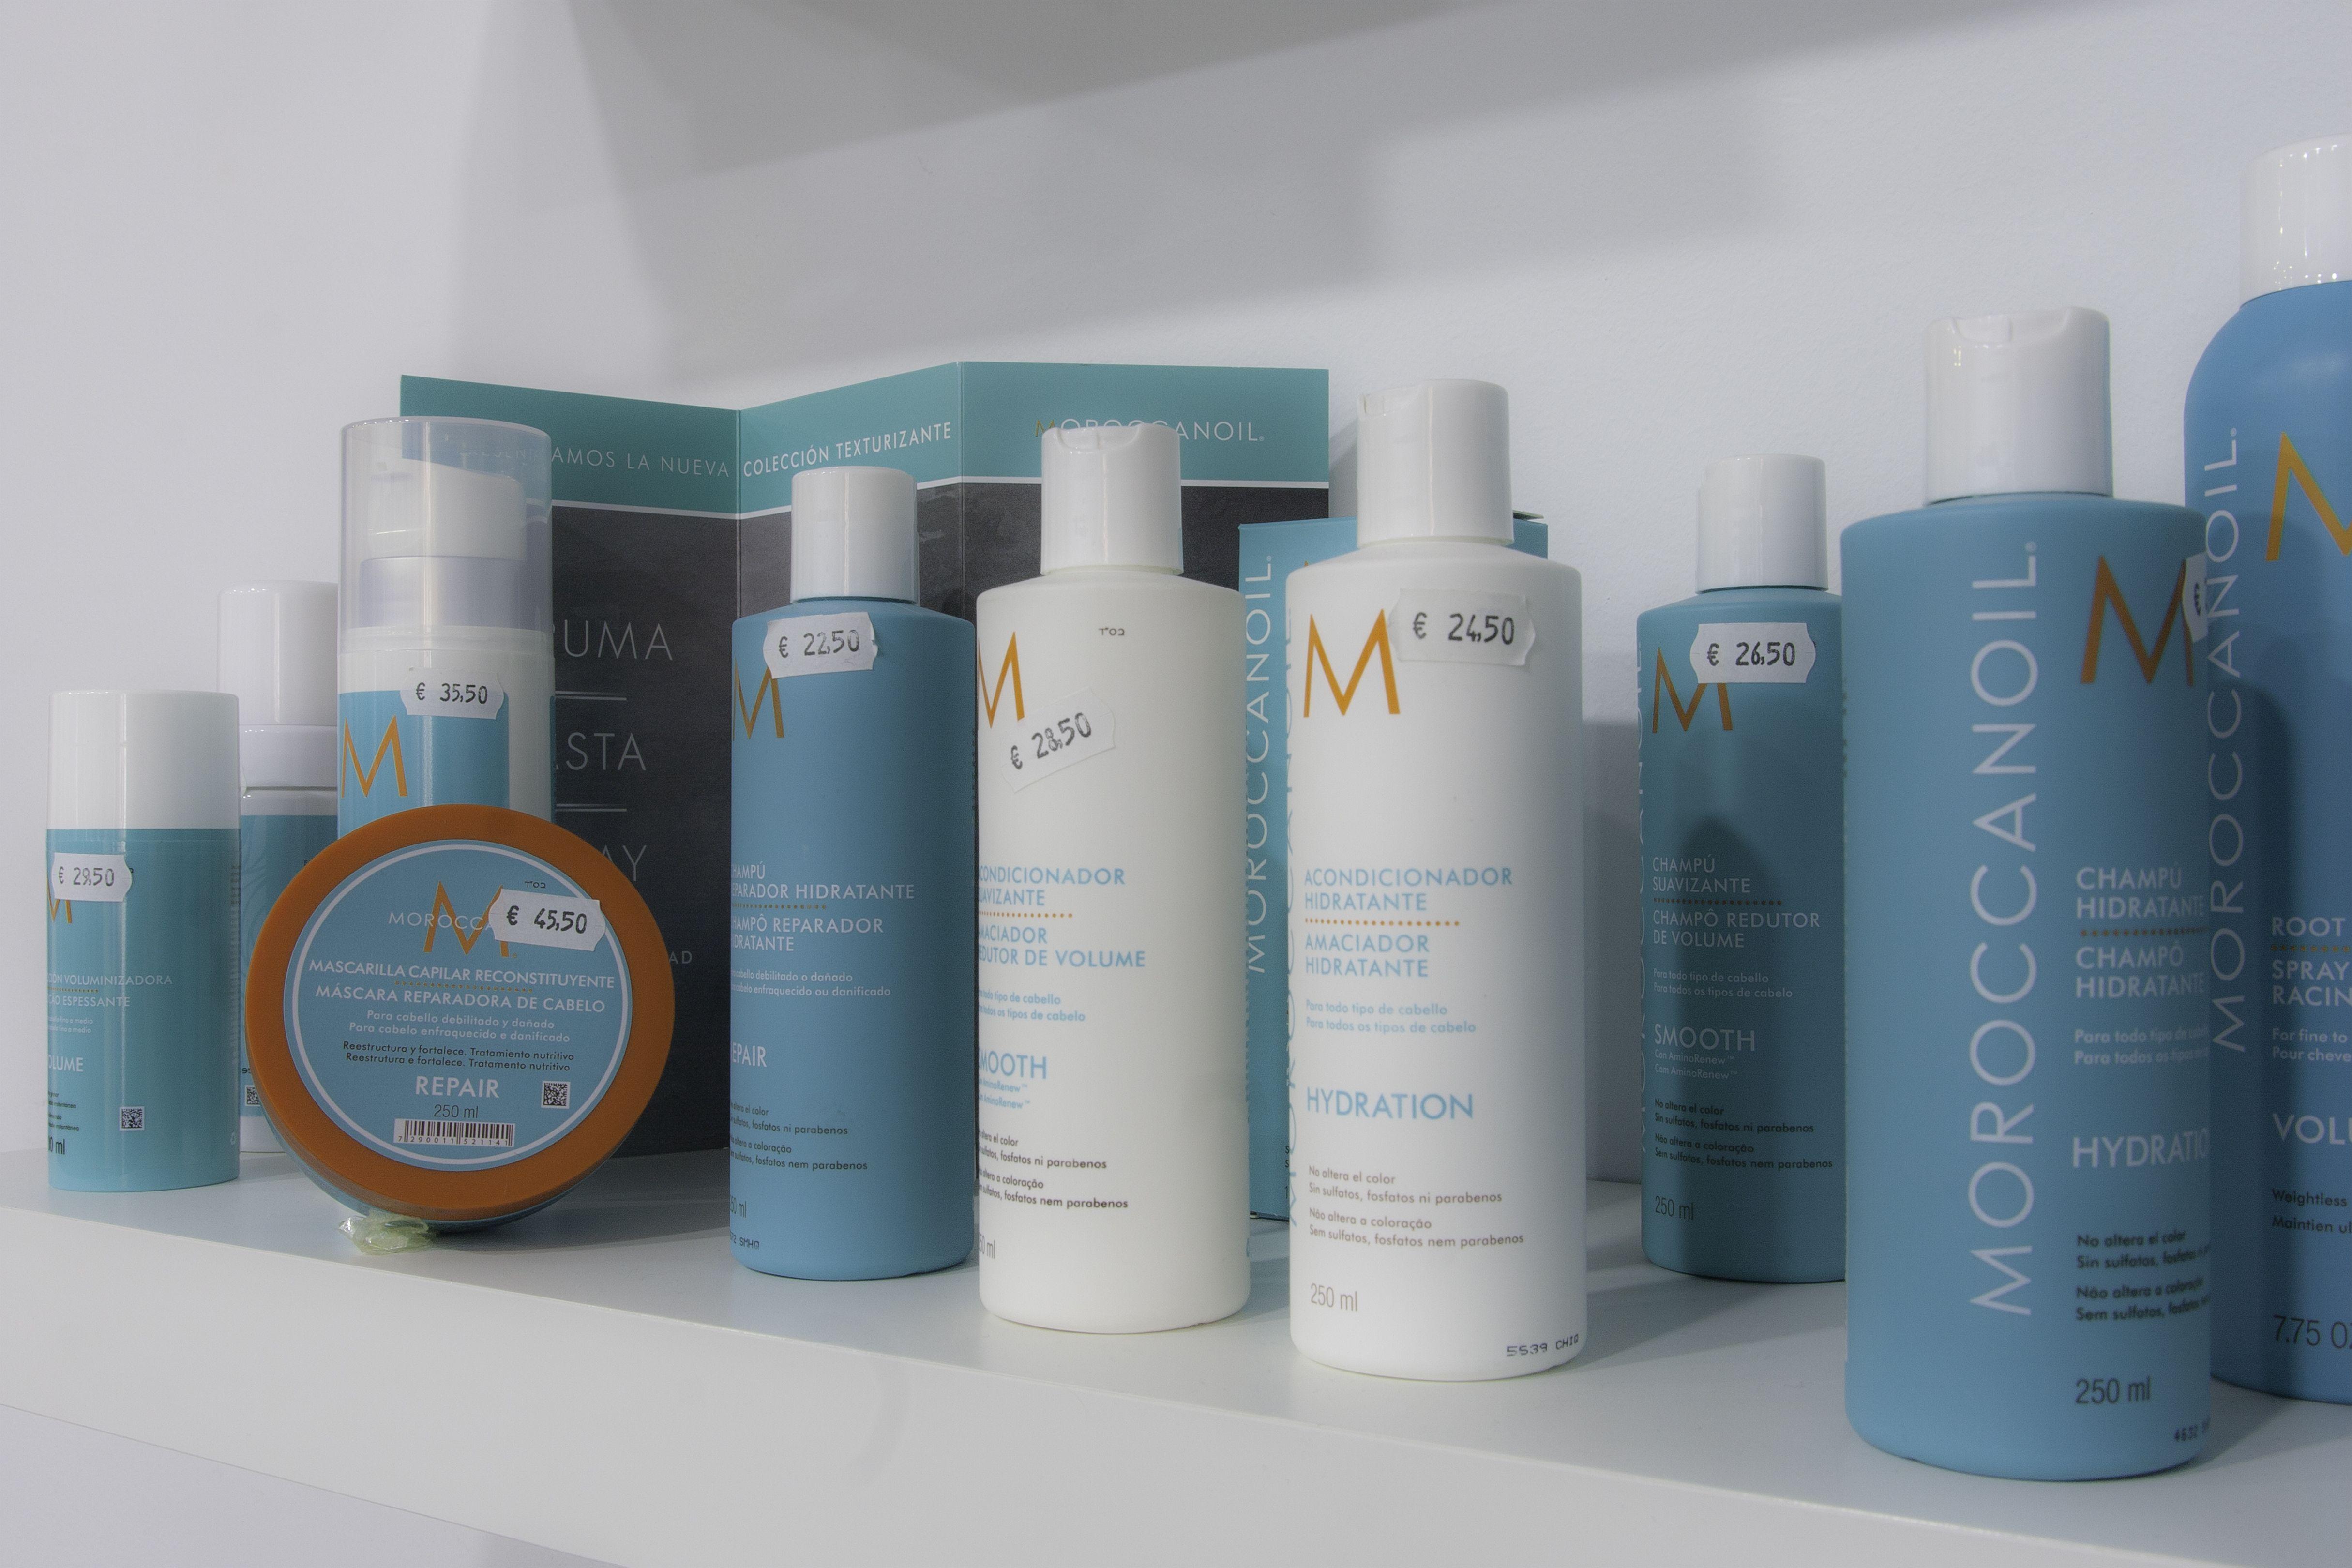 Productos de cosmética en Gijón